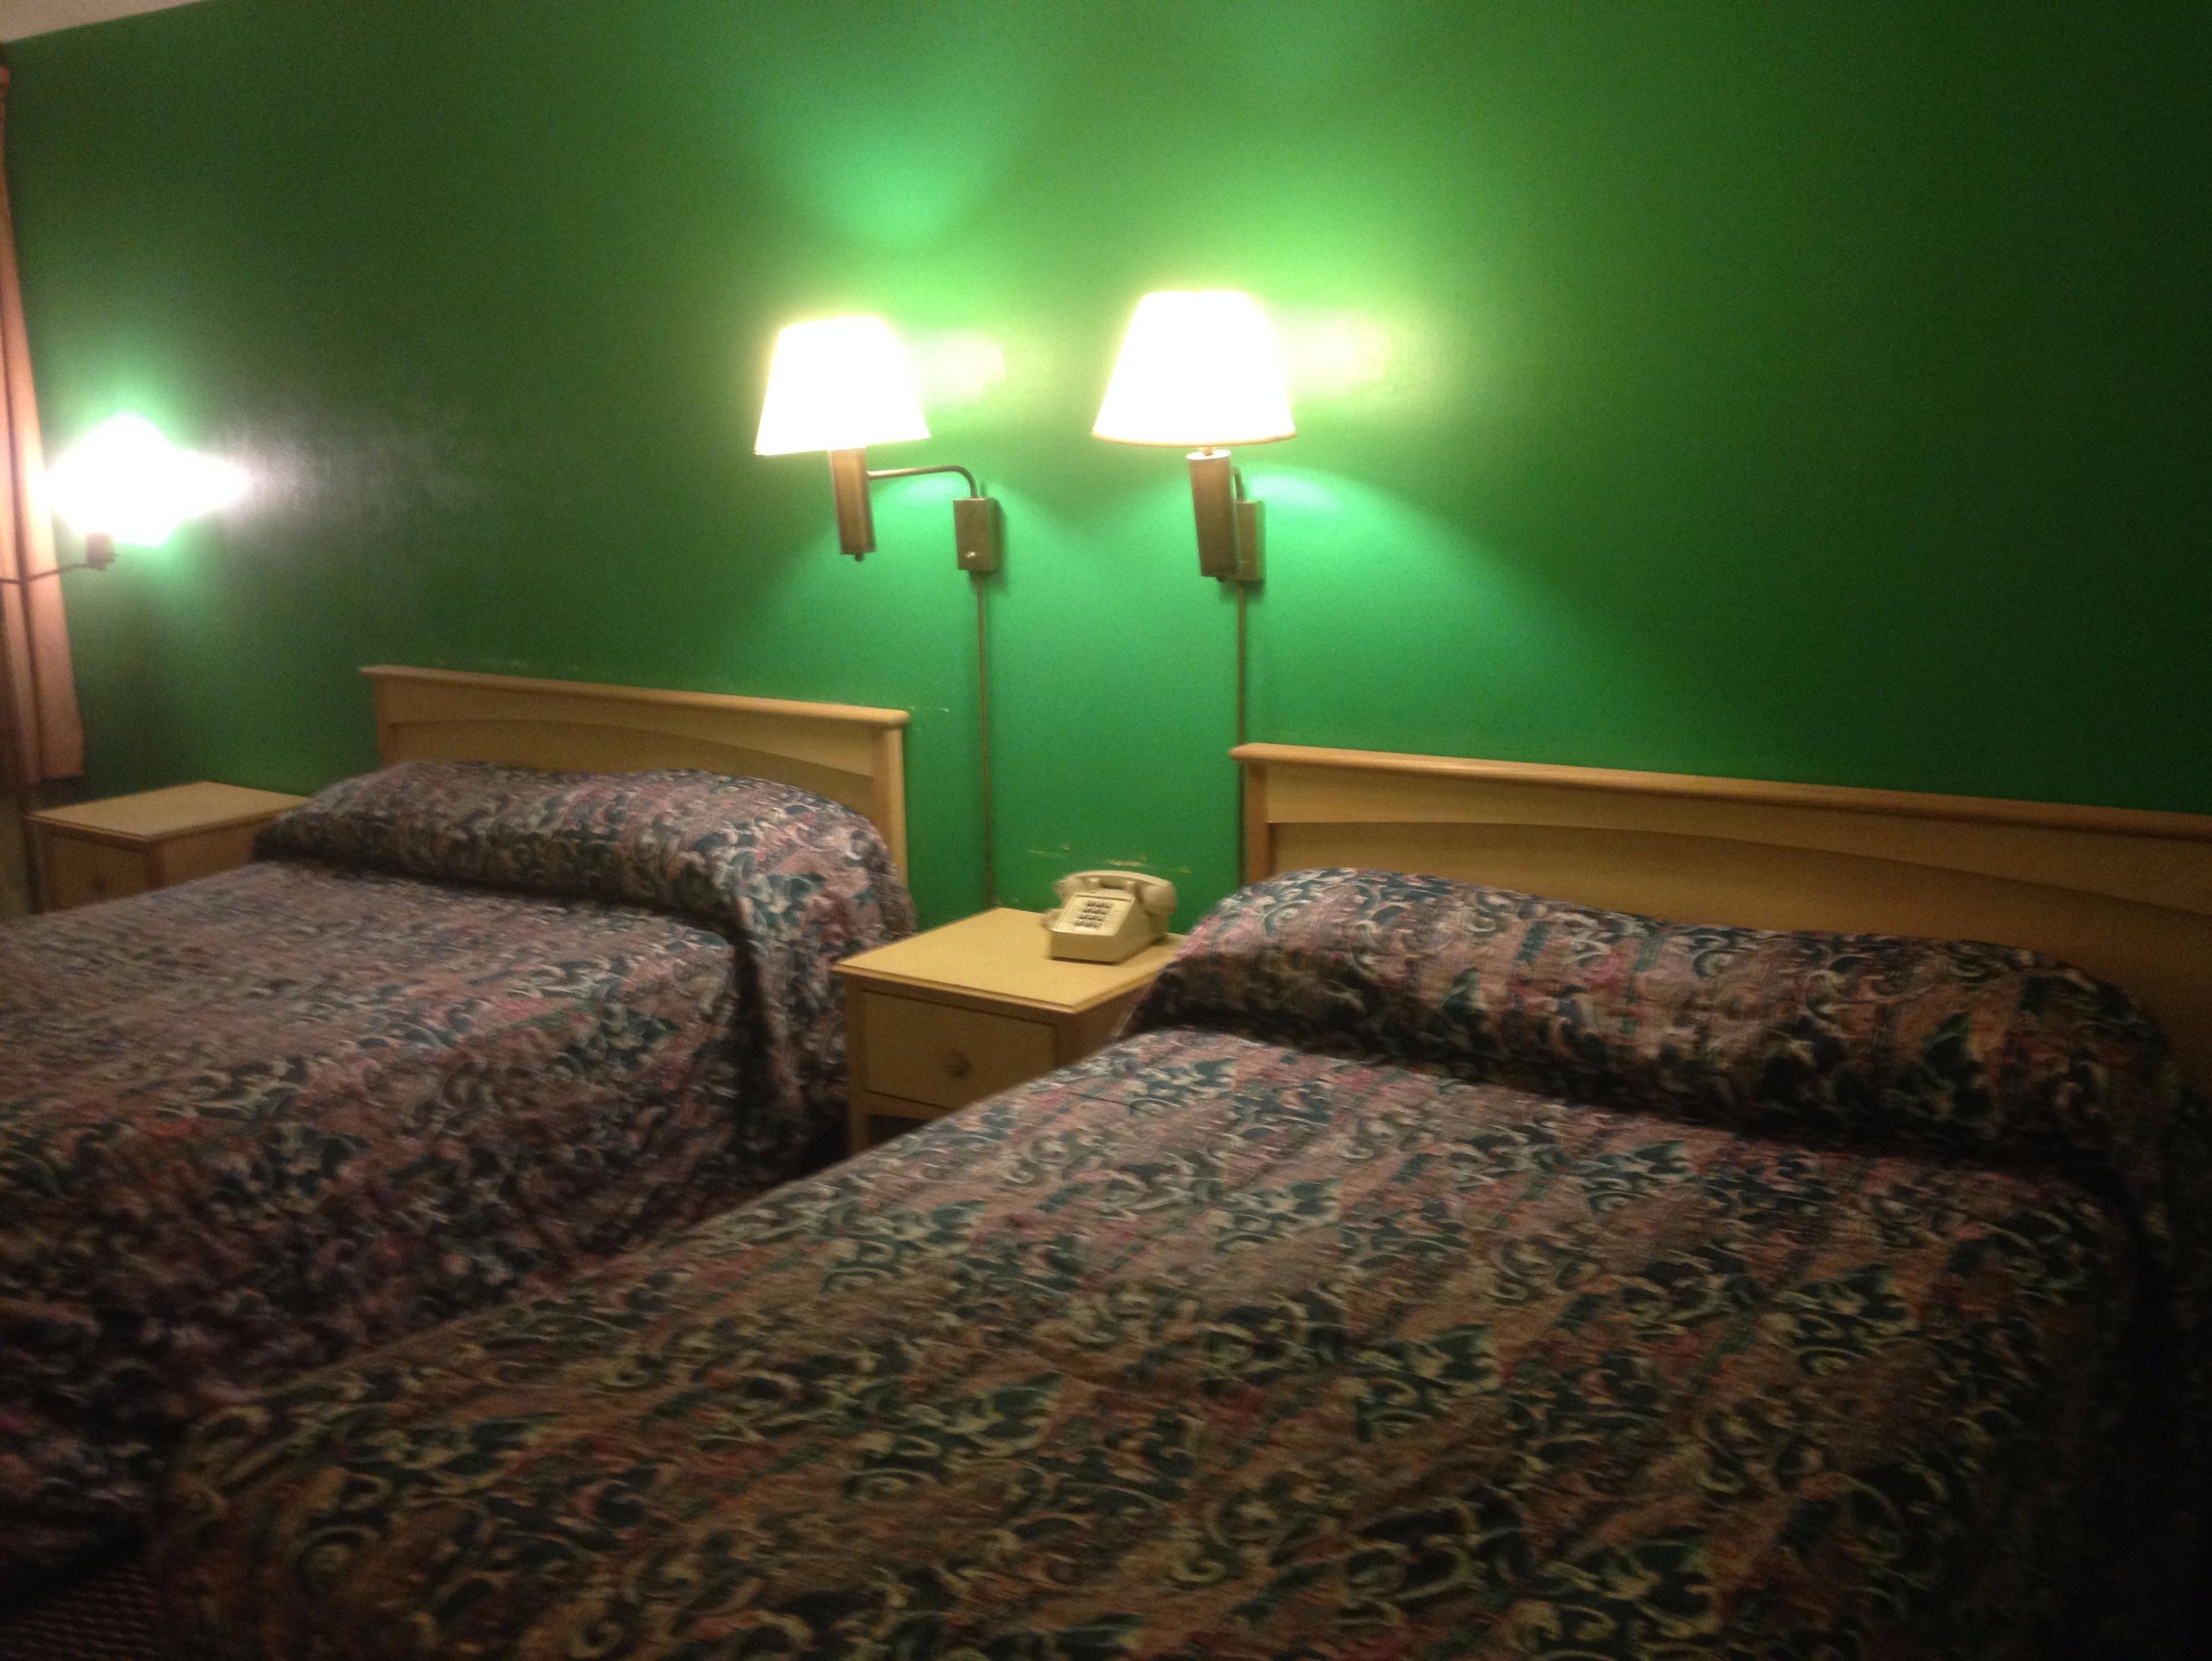 Red Carpet Inn & Suites image 8